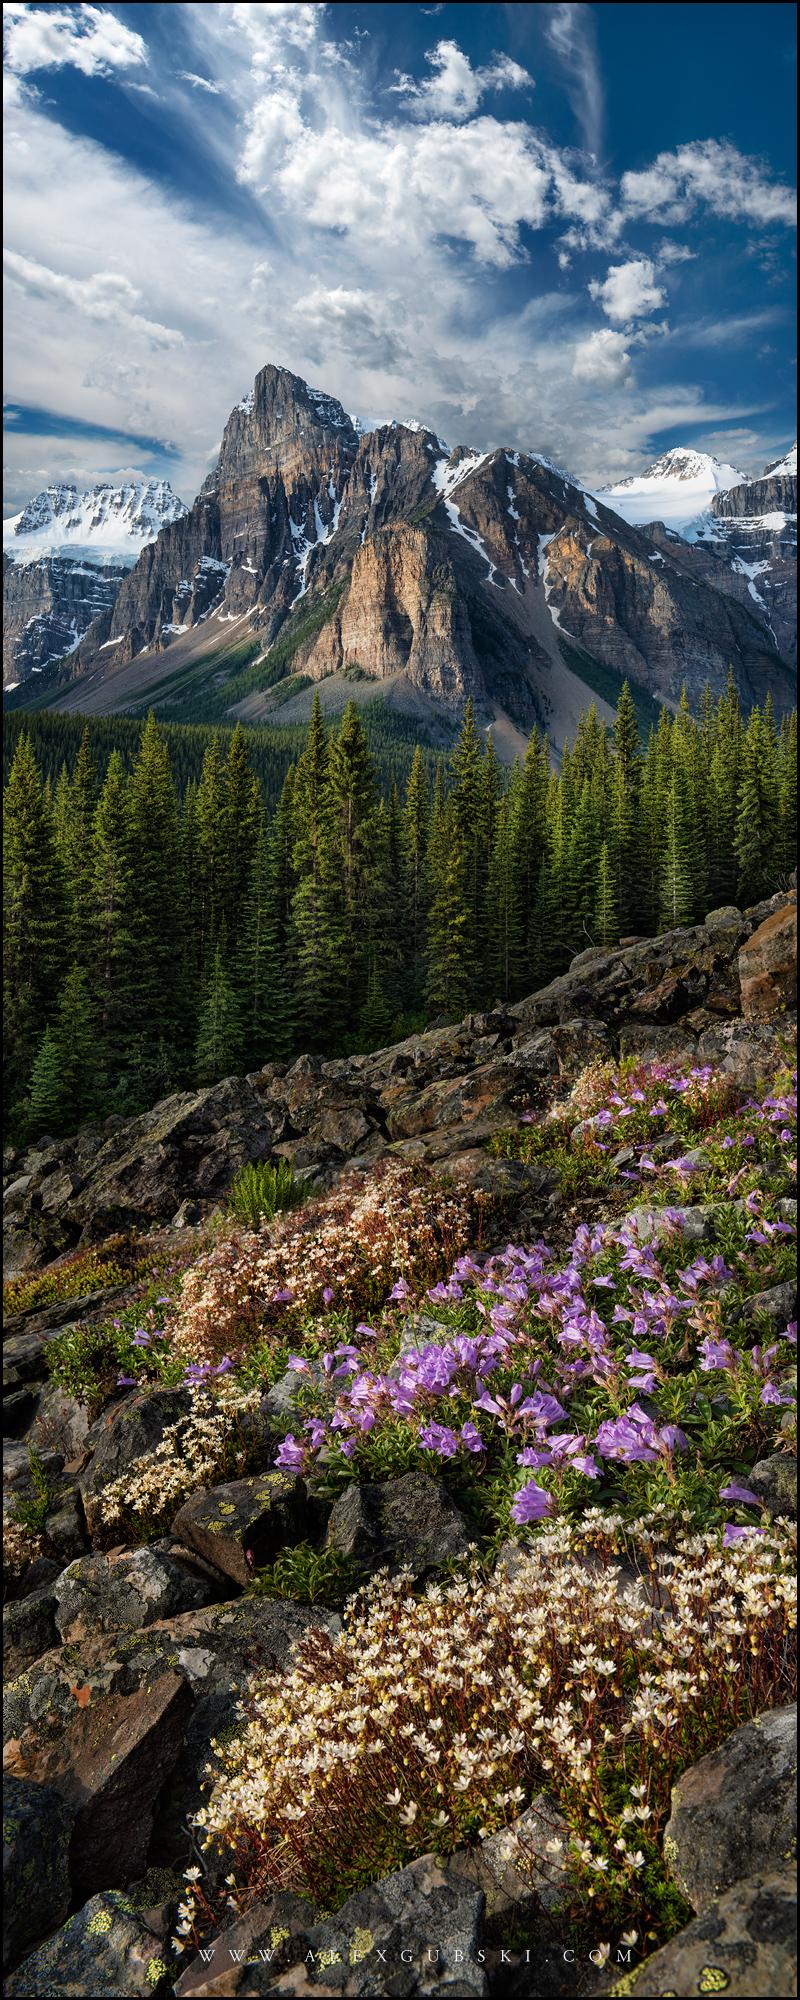 653_Calgary_photographer_Alexander_Gubski